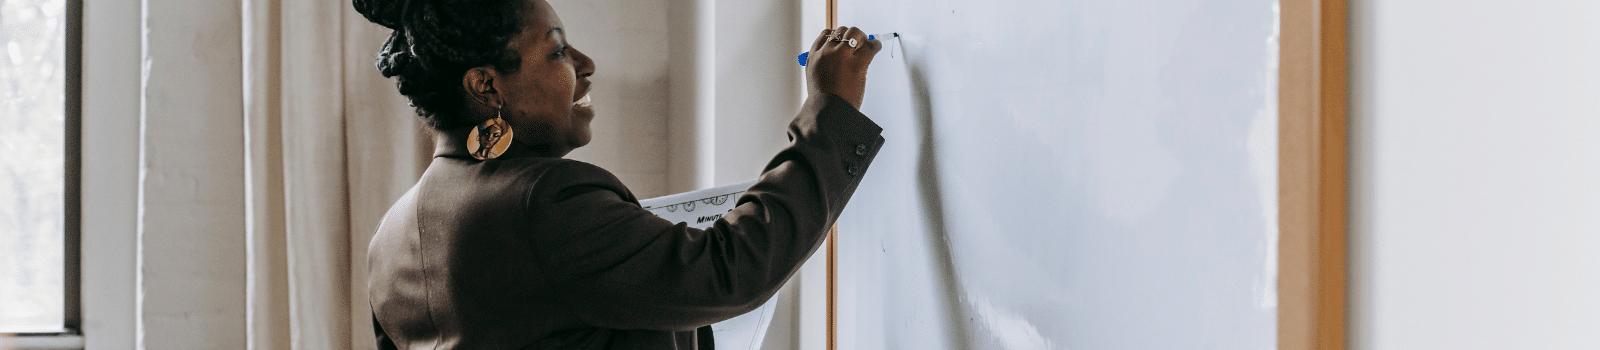 A woman writing on a whiteboard